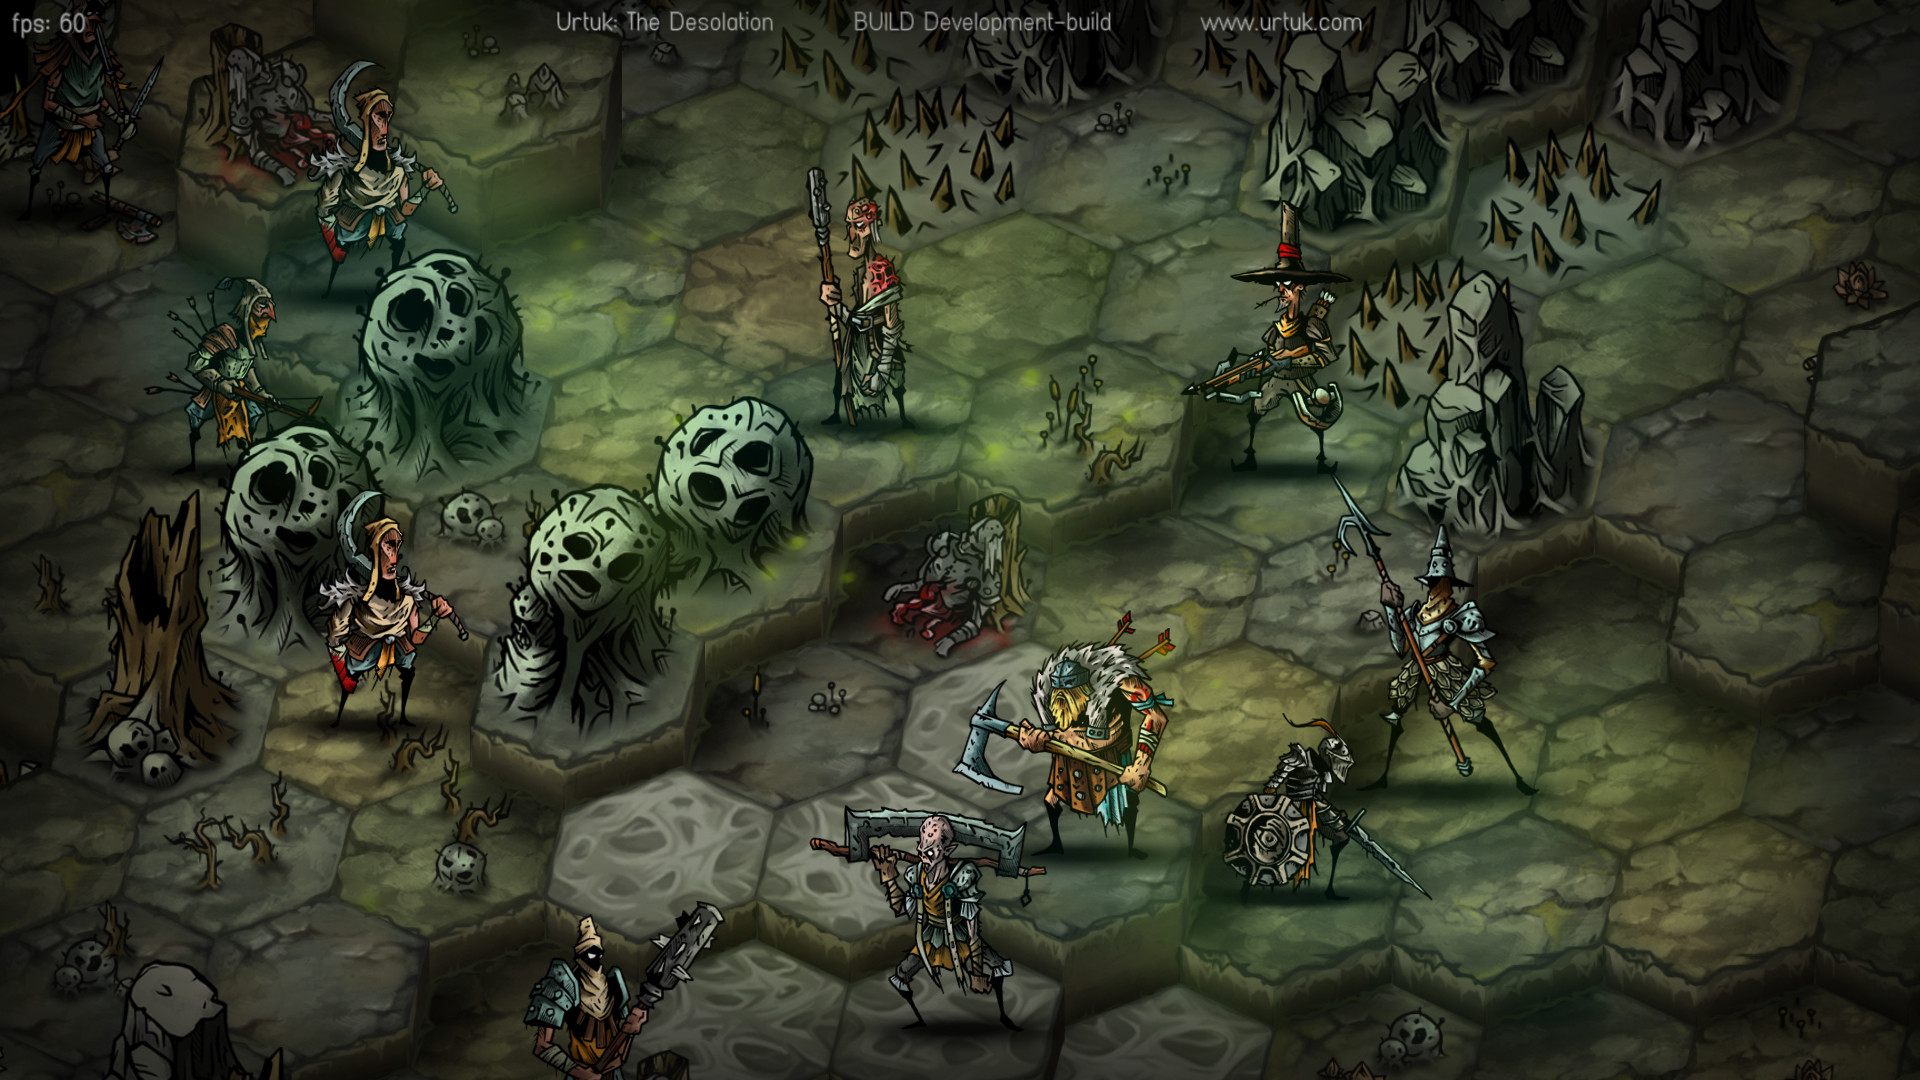 Urtuk: The Desolation Soundtrack screenshot